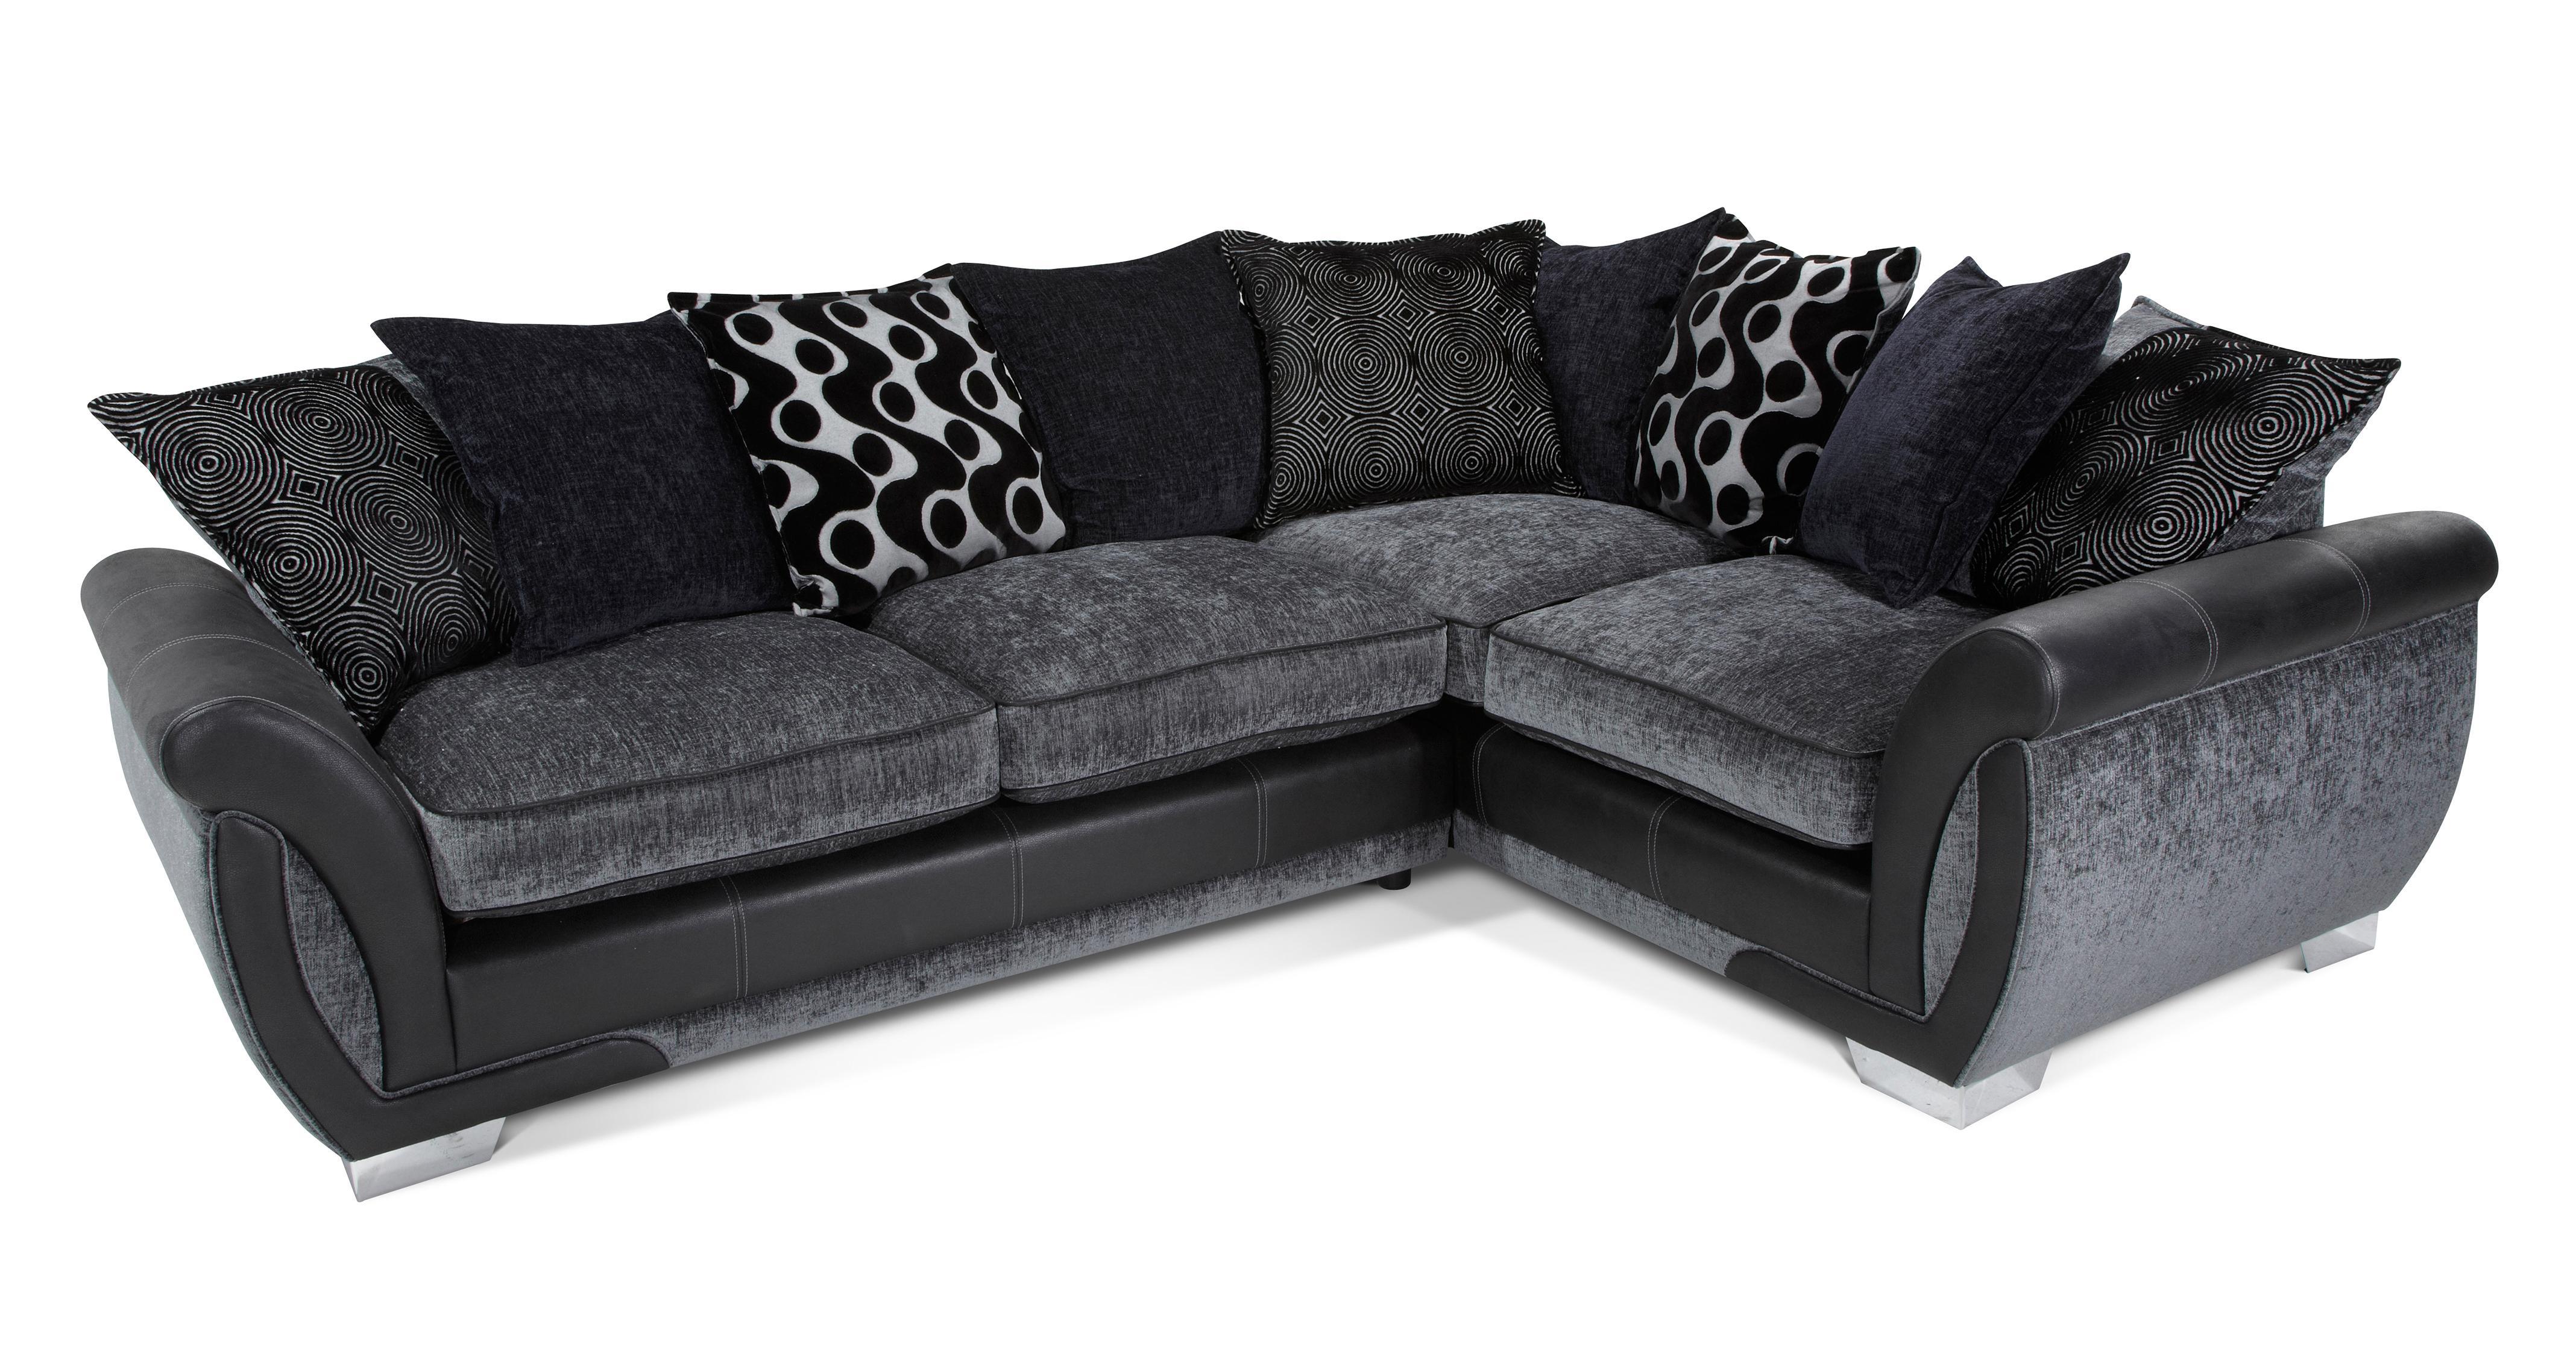 Awesome Dfs Dark Grey Corner Sofa Redglobalmx Org Inzonedesignstudio Interior Chair Design Inzonedesignstudiocom